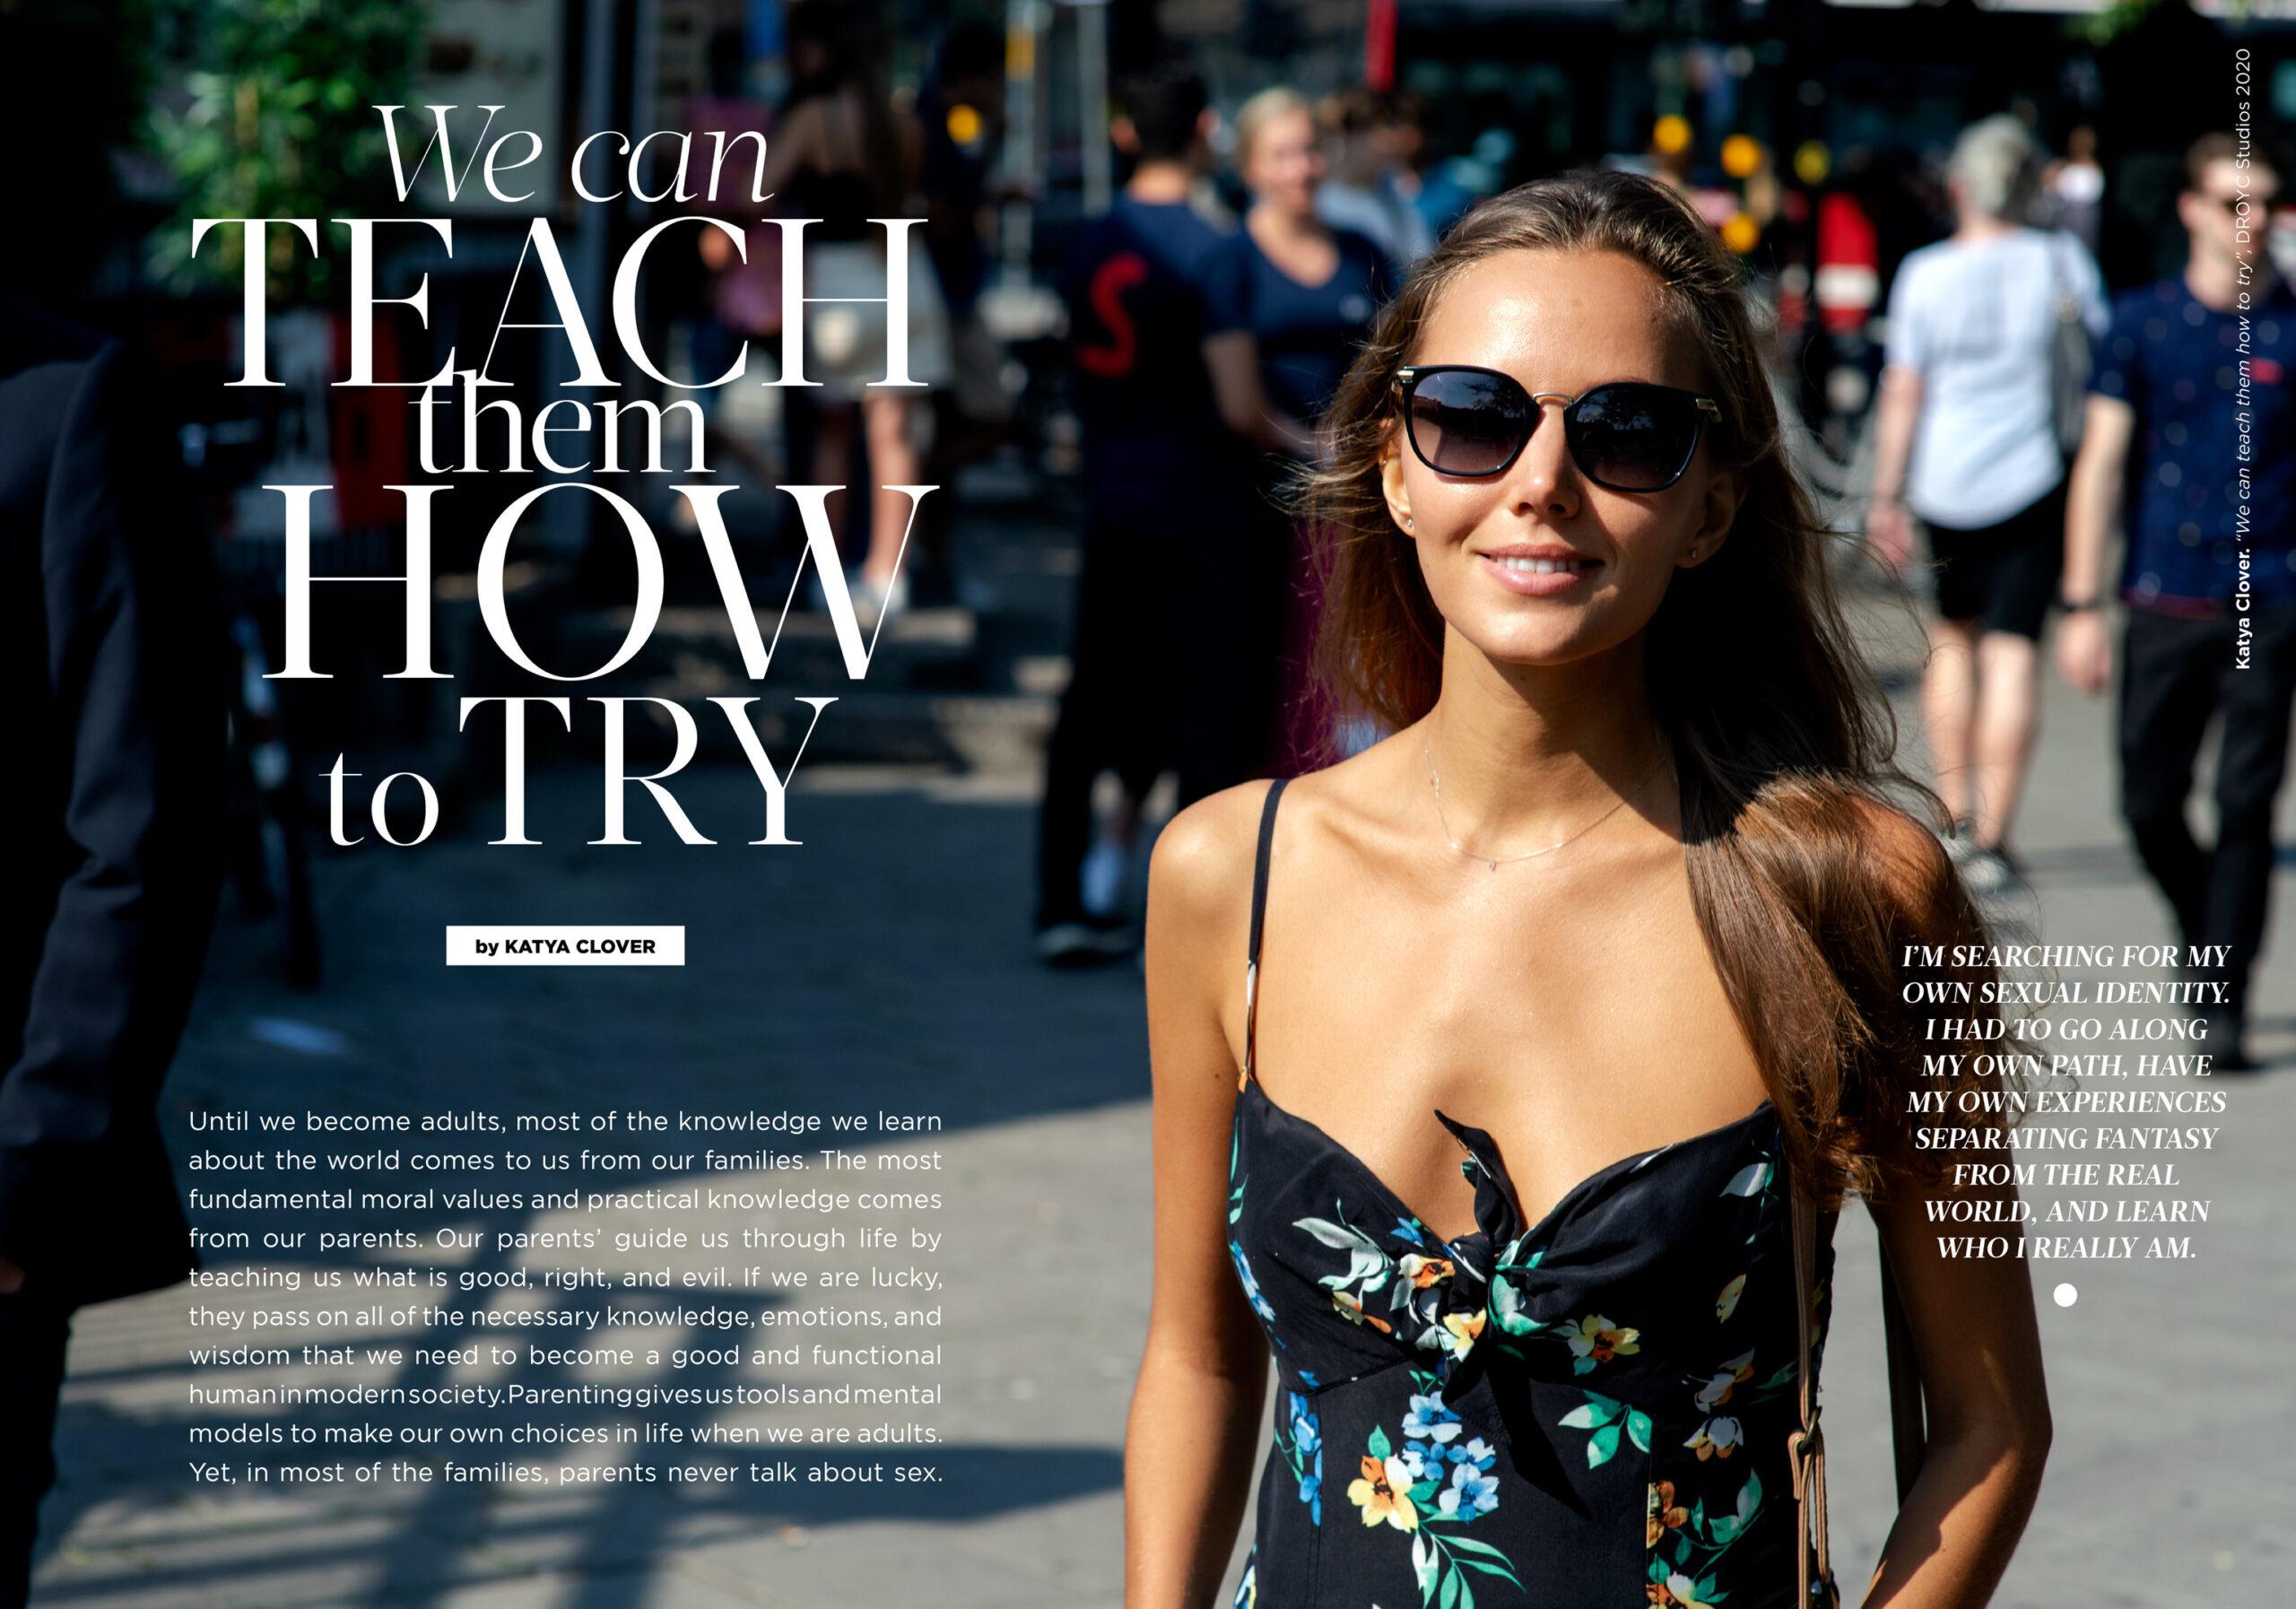 KatyaClover-DROYC-We_can_teach_them_how_to_try-3a